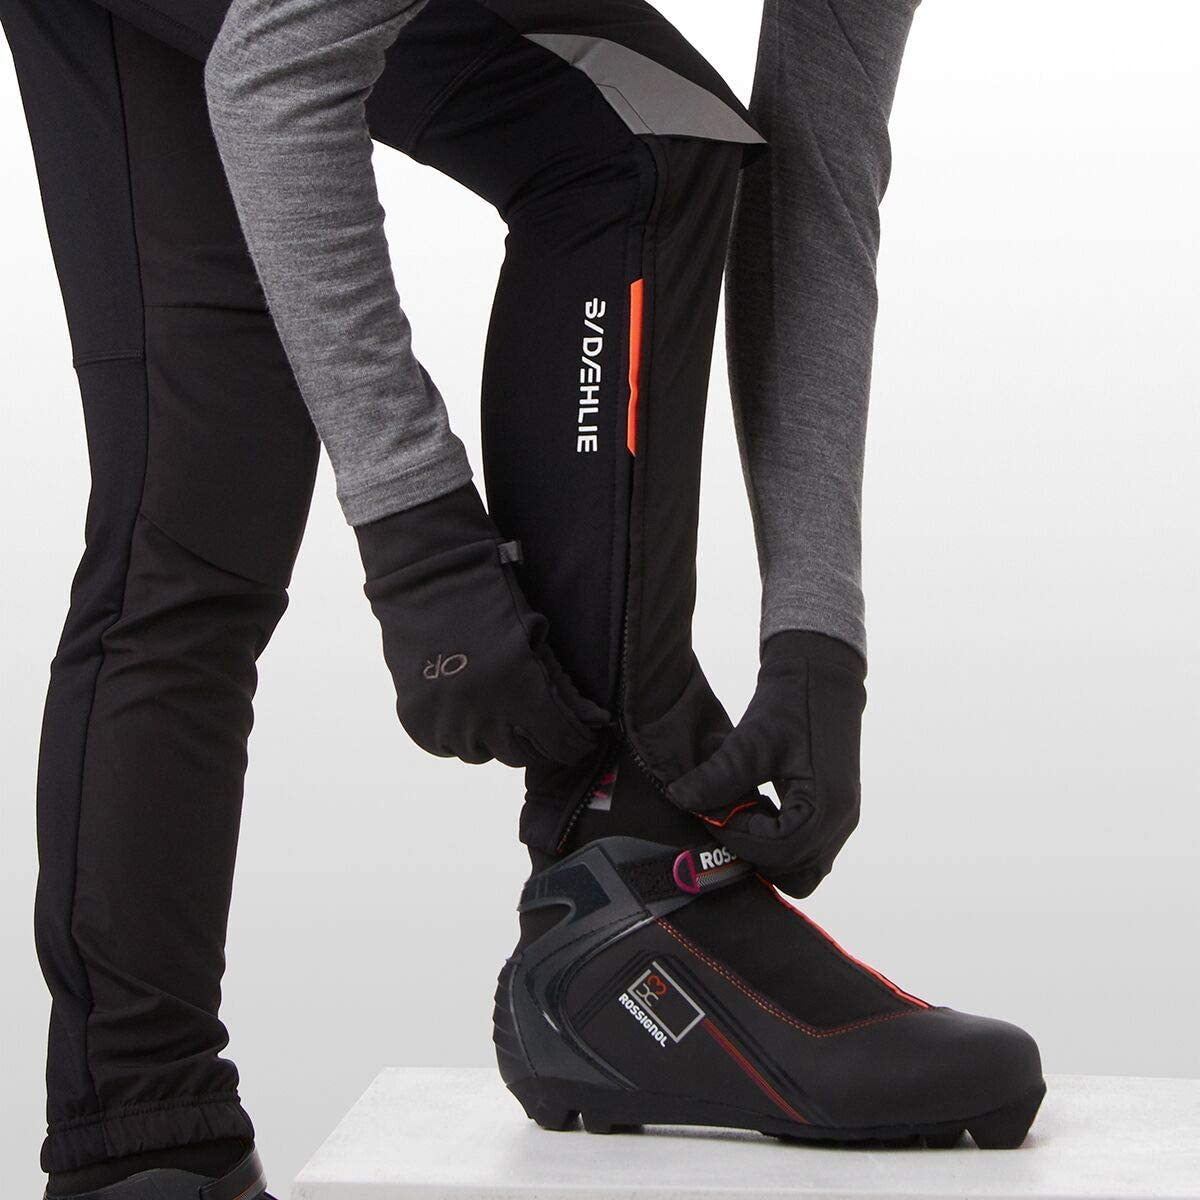 RUNNING LADY TWYCE OW PANTS SS17 TRERE INNOVATION S.R.L de sporting goods XBIOO O100671 X-Bionic Womens Running Shorts Lady Twyce OW Pants SS17 Womens